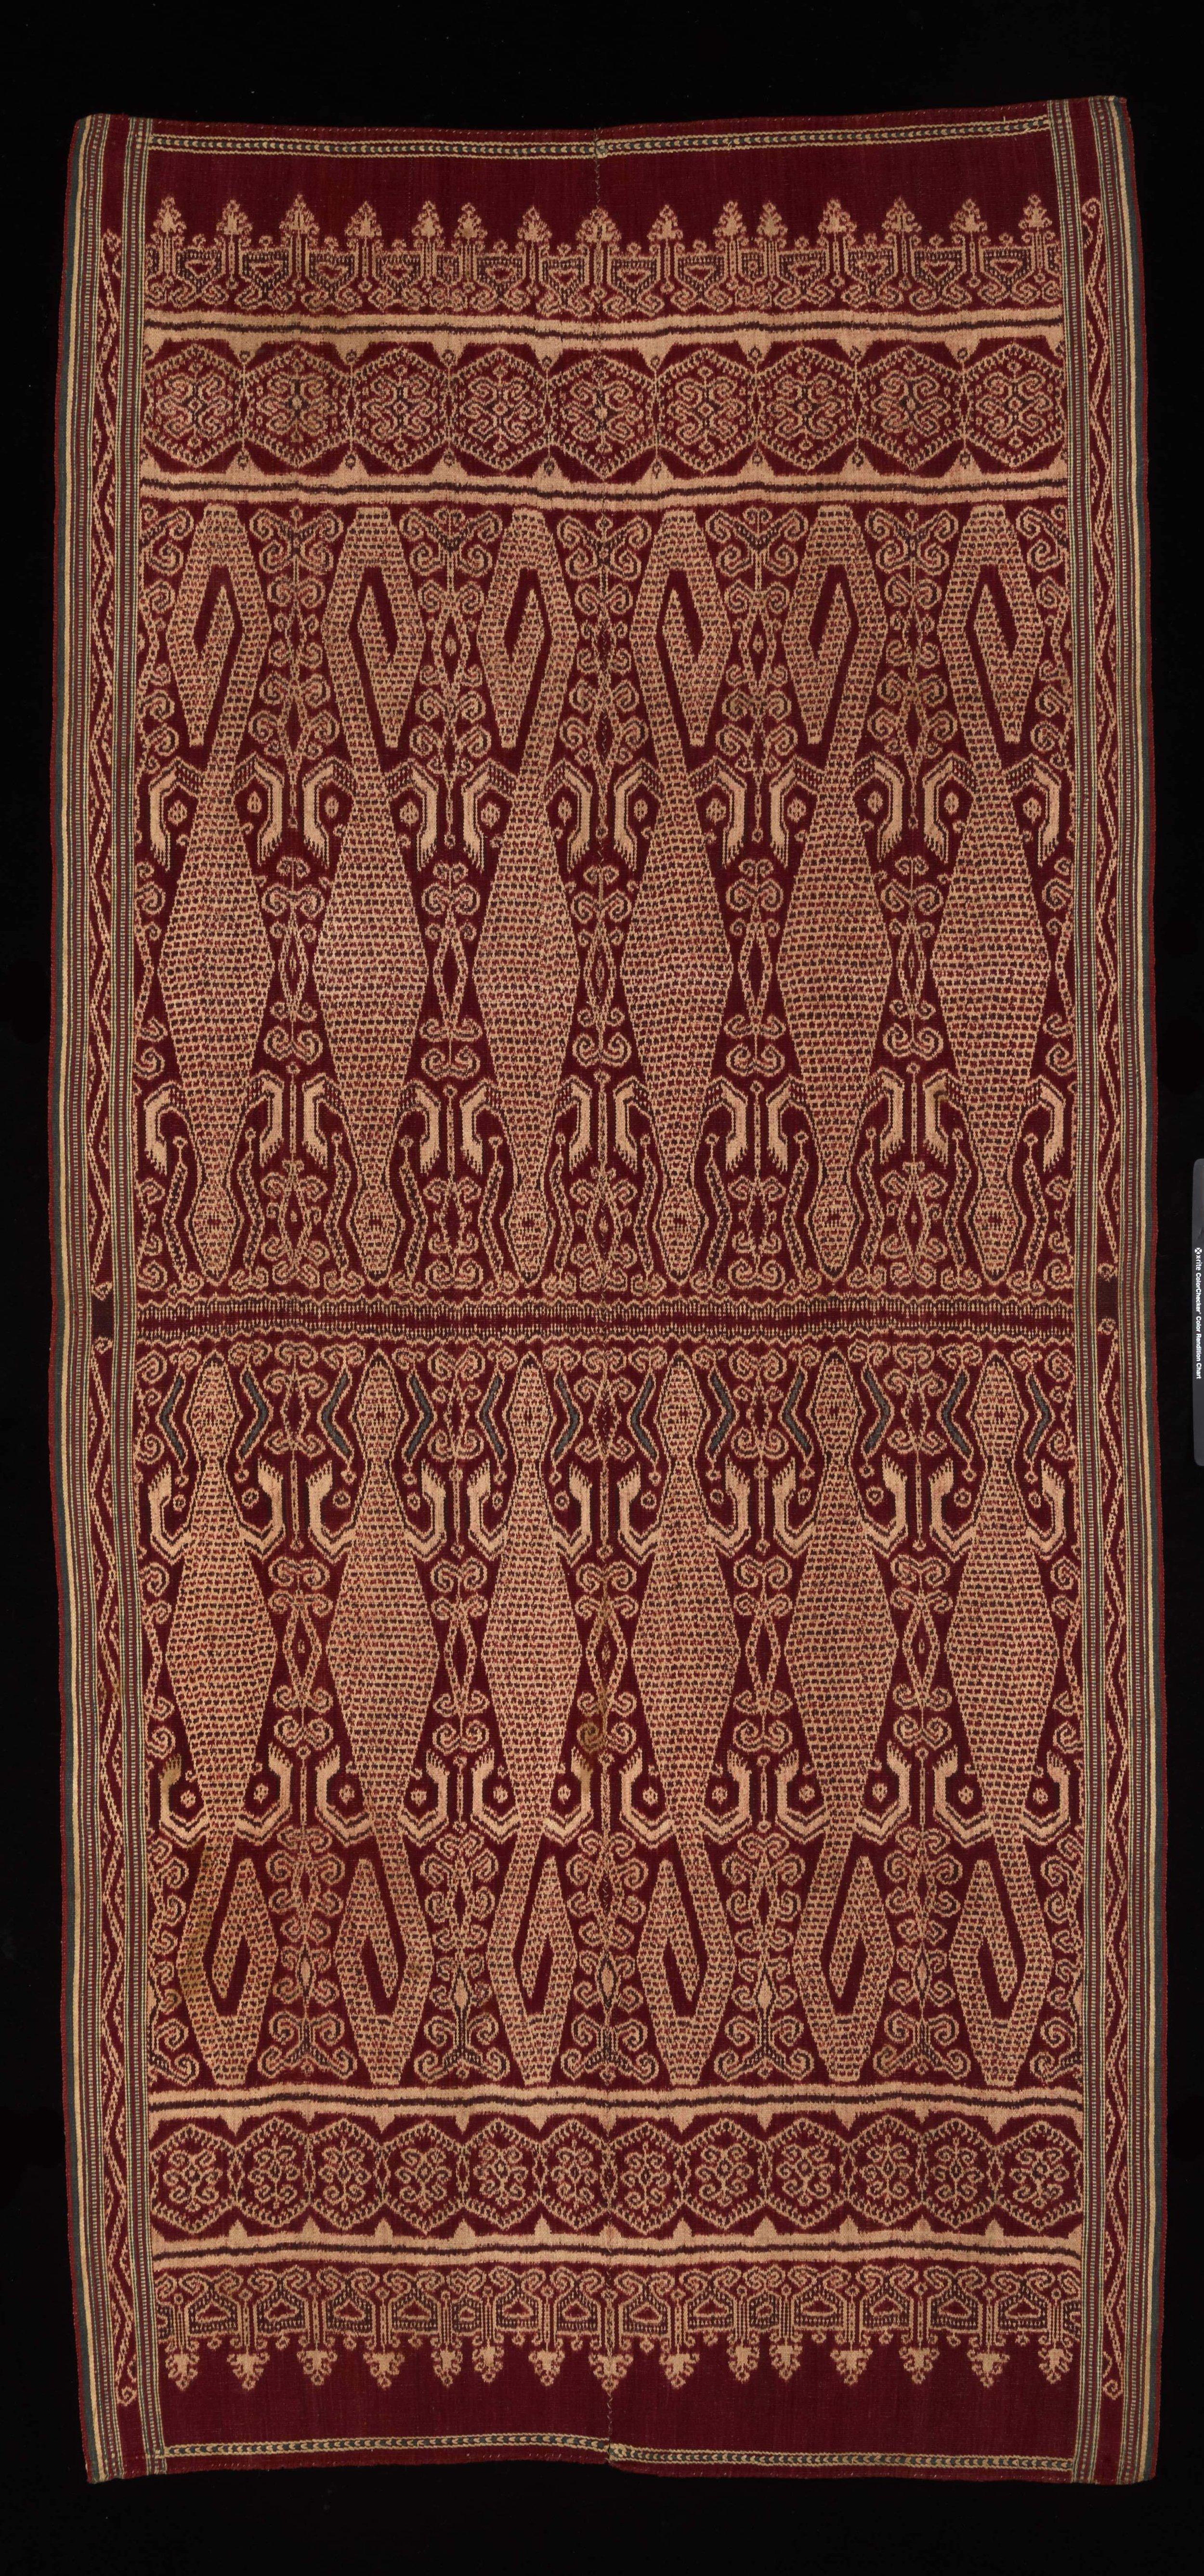 Iban Ceremonial Weaving | Pua Kumbu © Dallas Museum of Art | Texas, USA